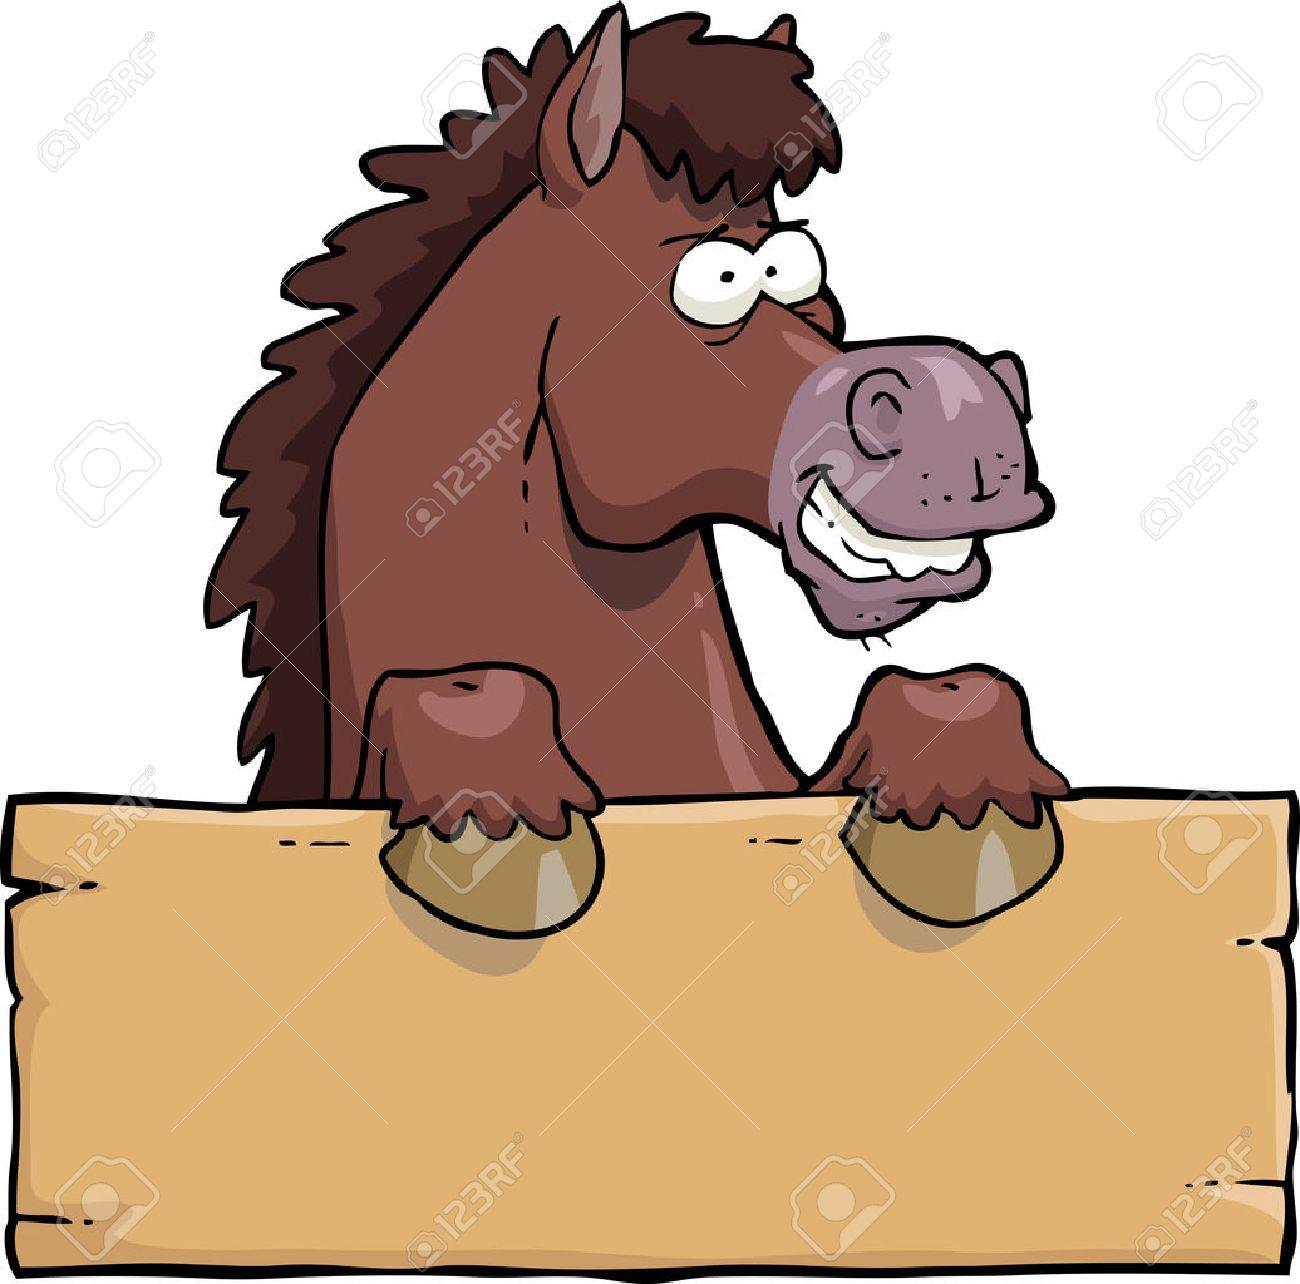 Cartoon horse head with a board vector illustration - 52987609